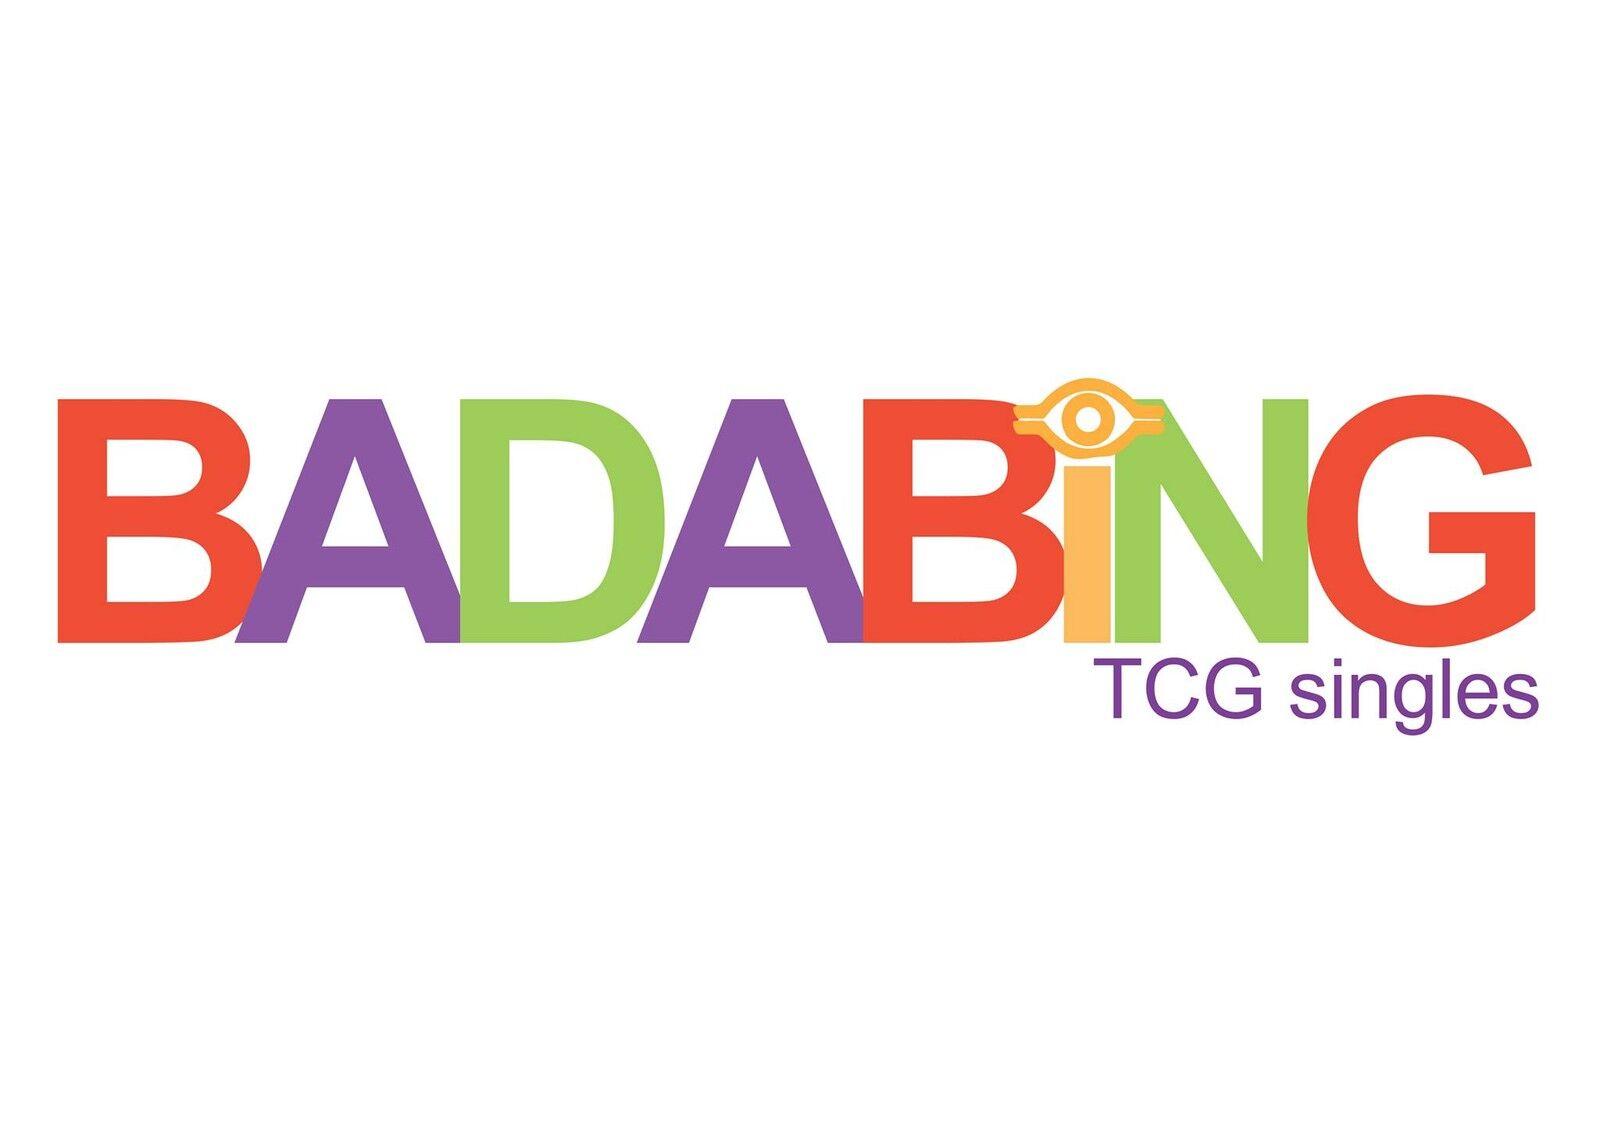 Badabing TCG Singles